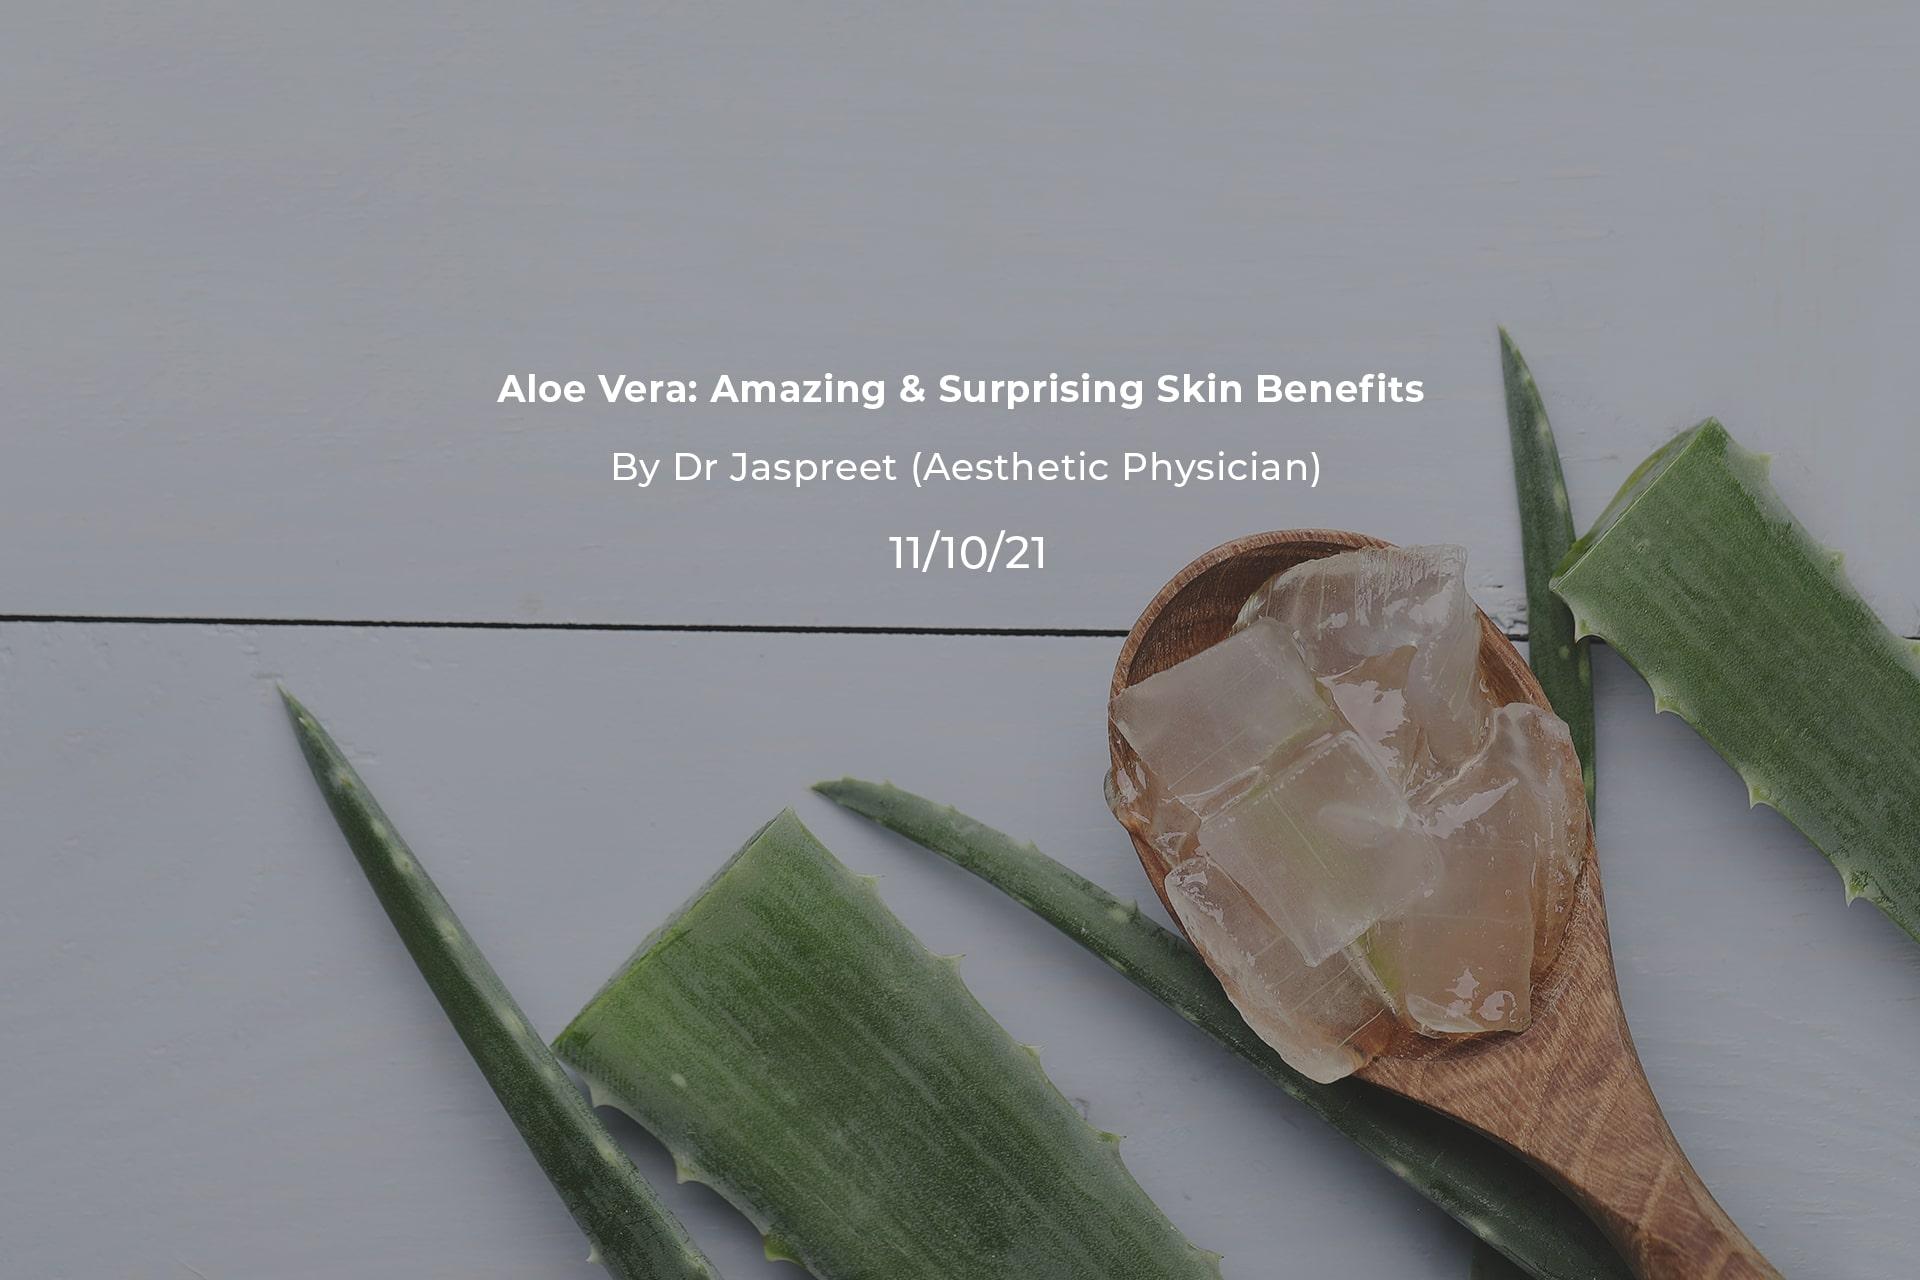 Aloe Vera Amazing & Surprising Skin Benefits